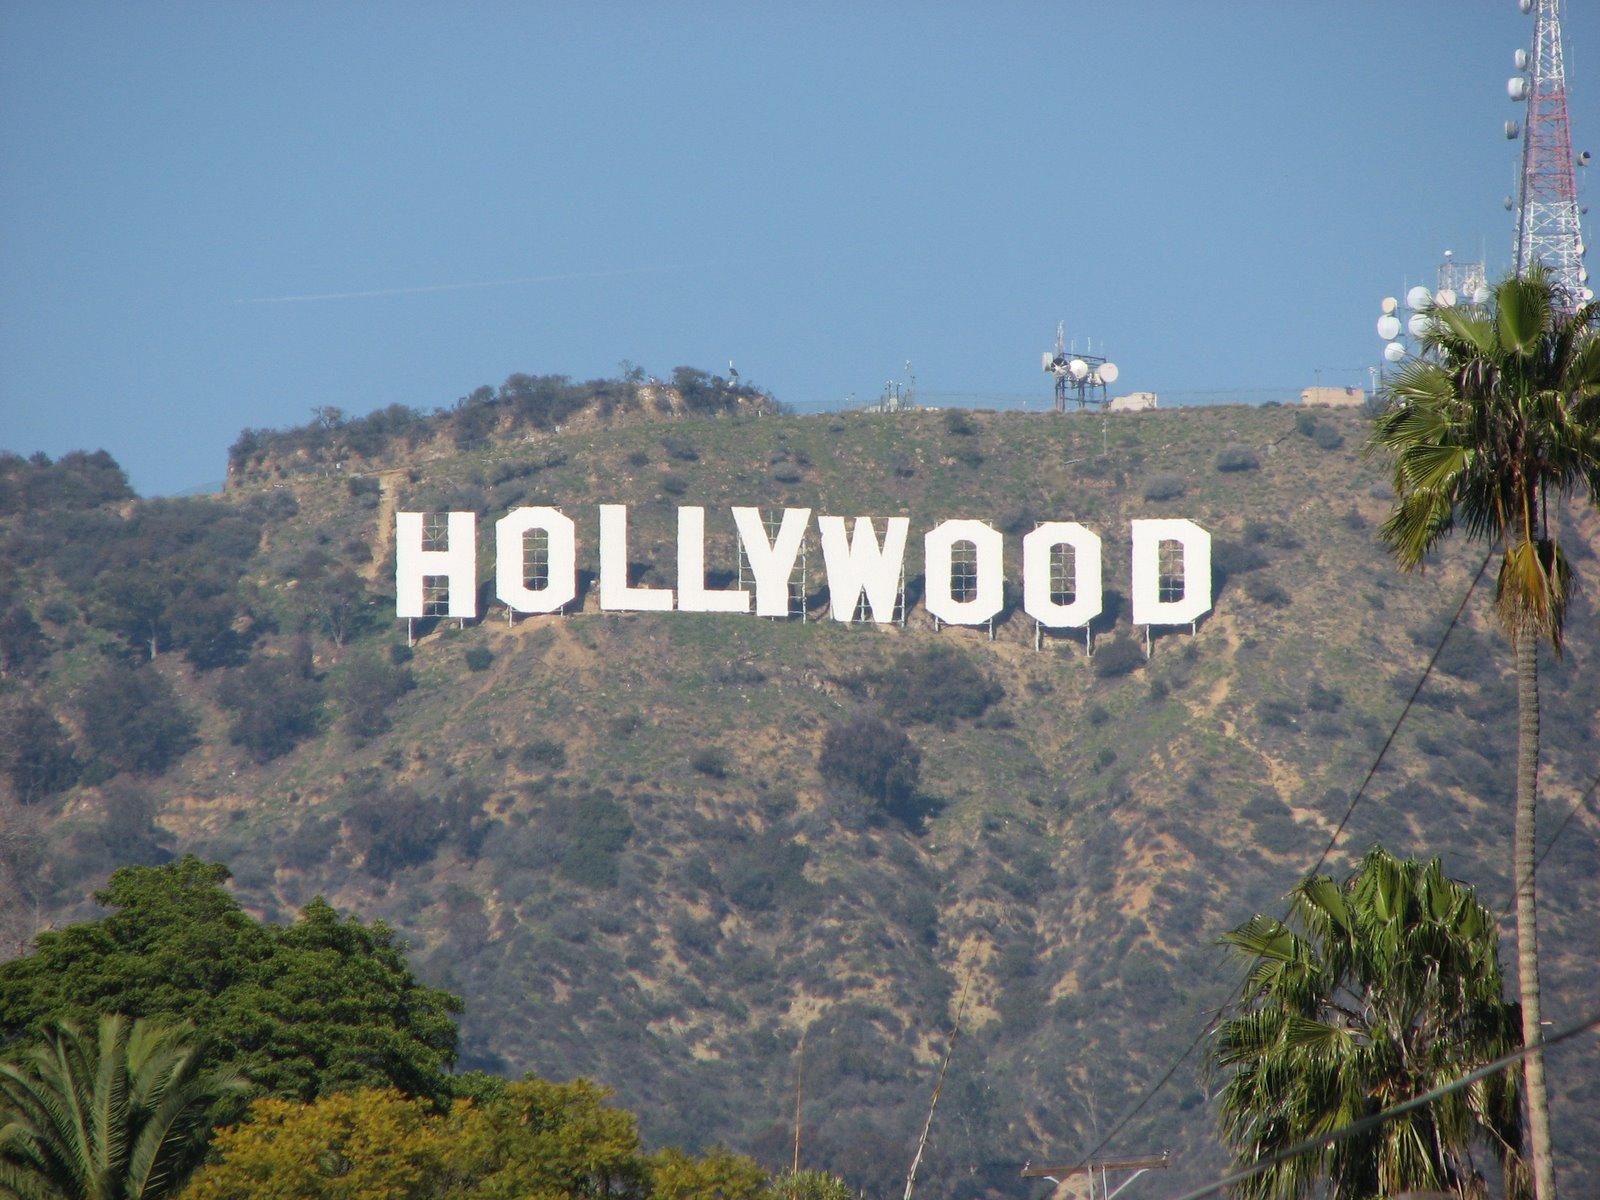 Hollywood sign wallpaper   ForWallpapercom 1600x1200